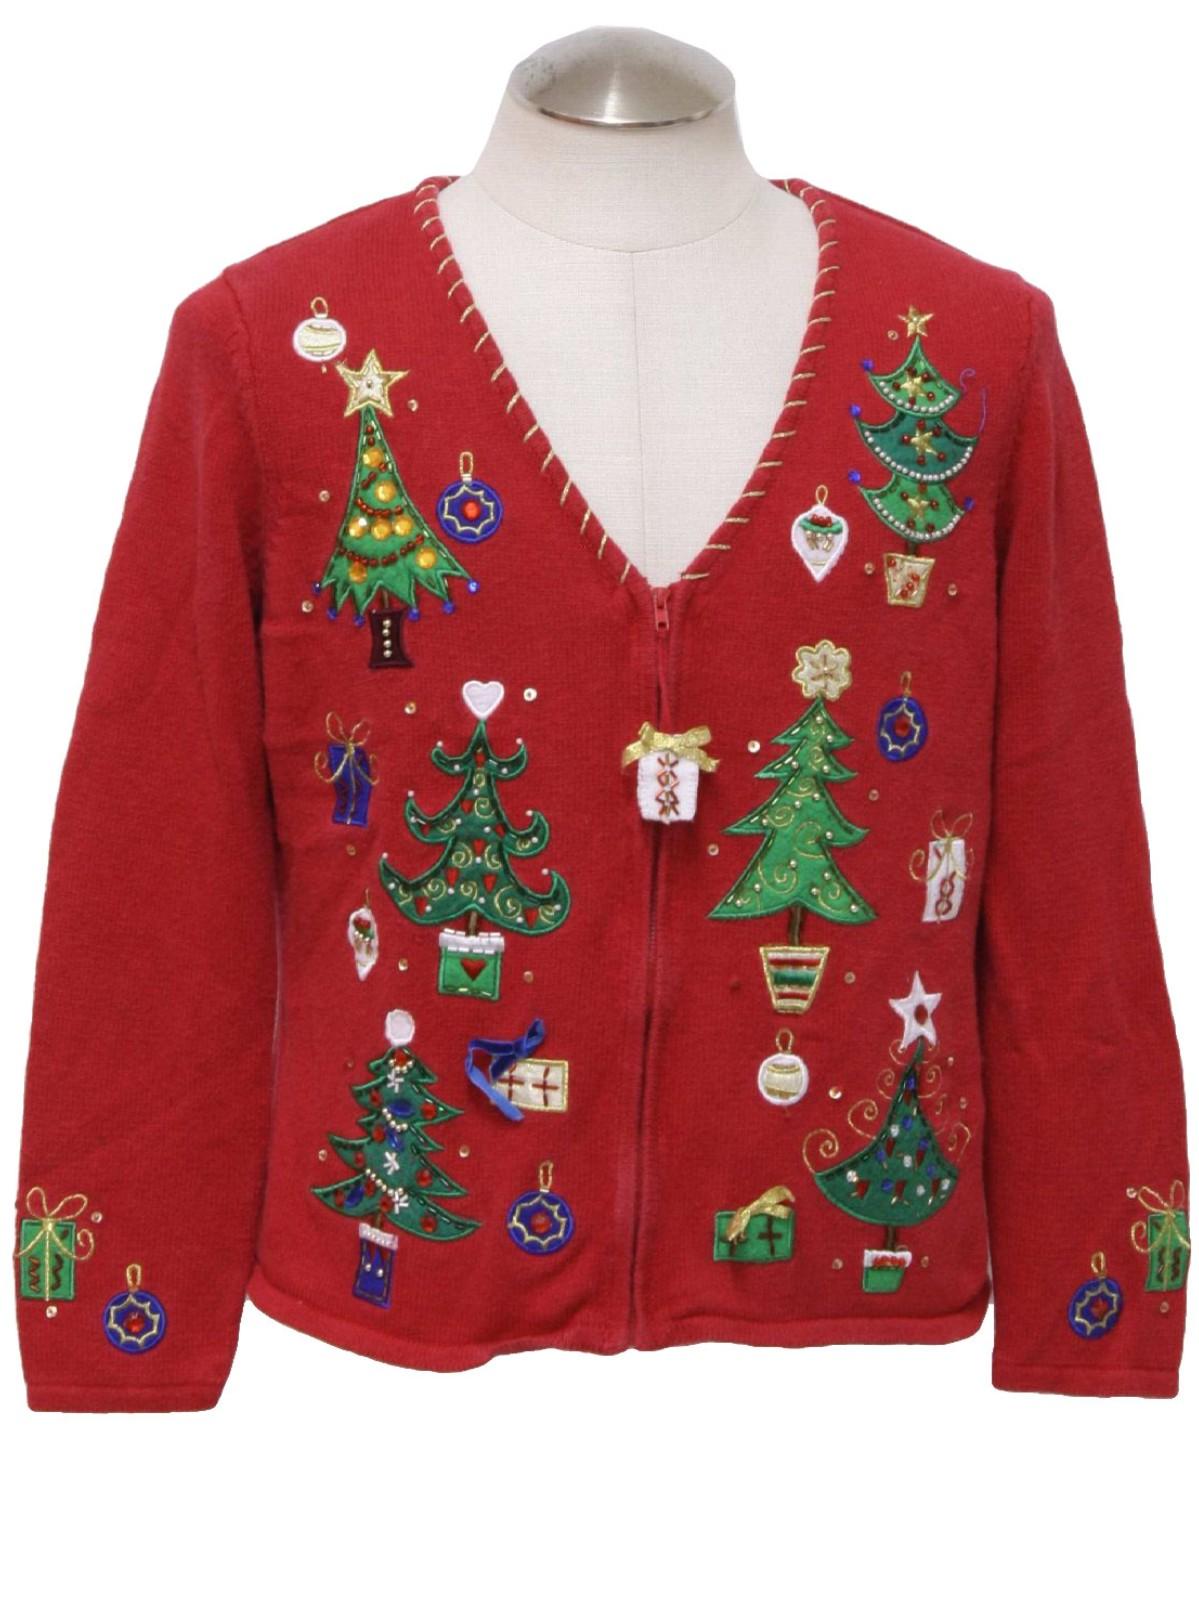 Womens Ugly Christmas Cardigan Sweater: -Tiara- Womens red ...